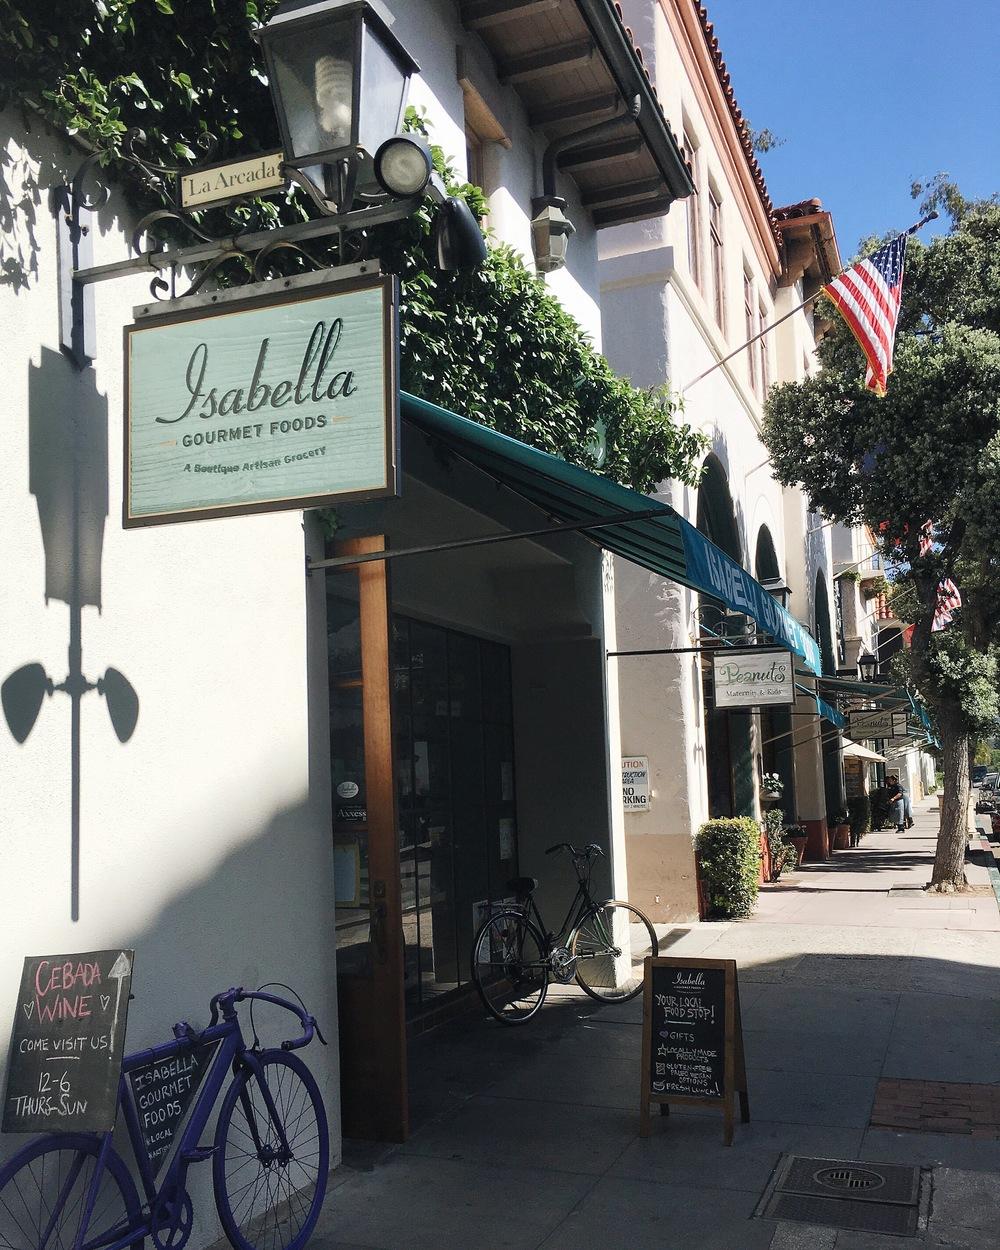 Isabella Gourmet Foods